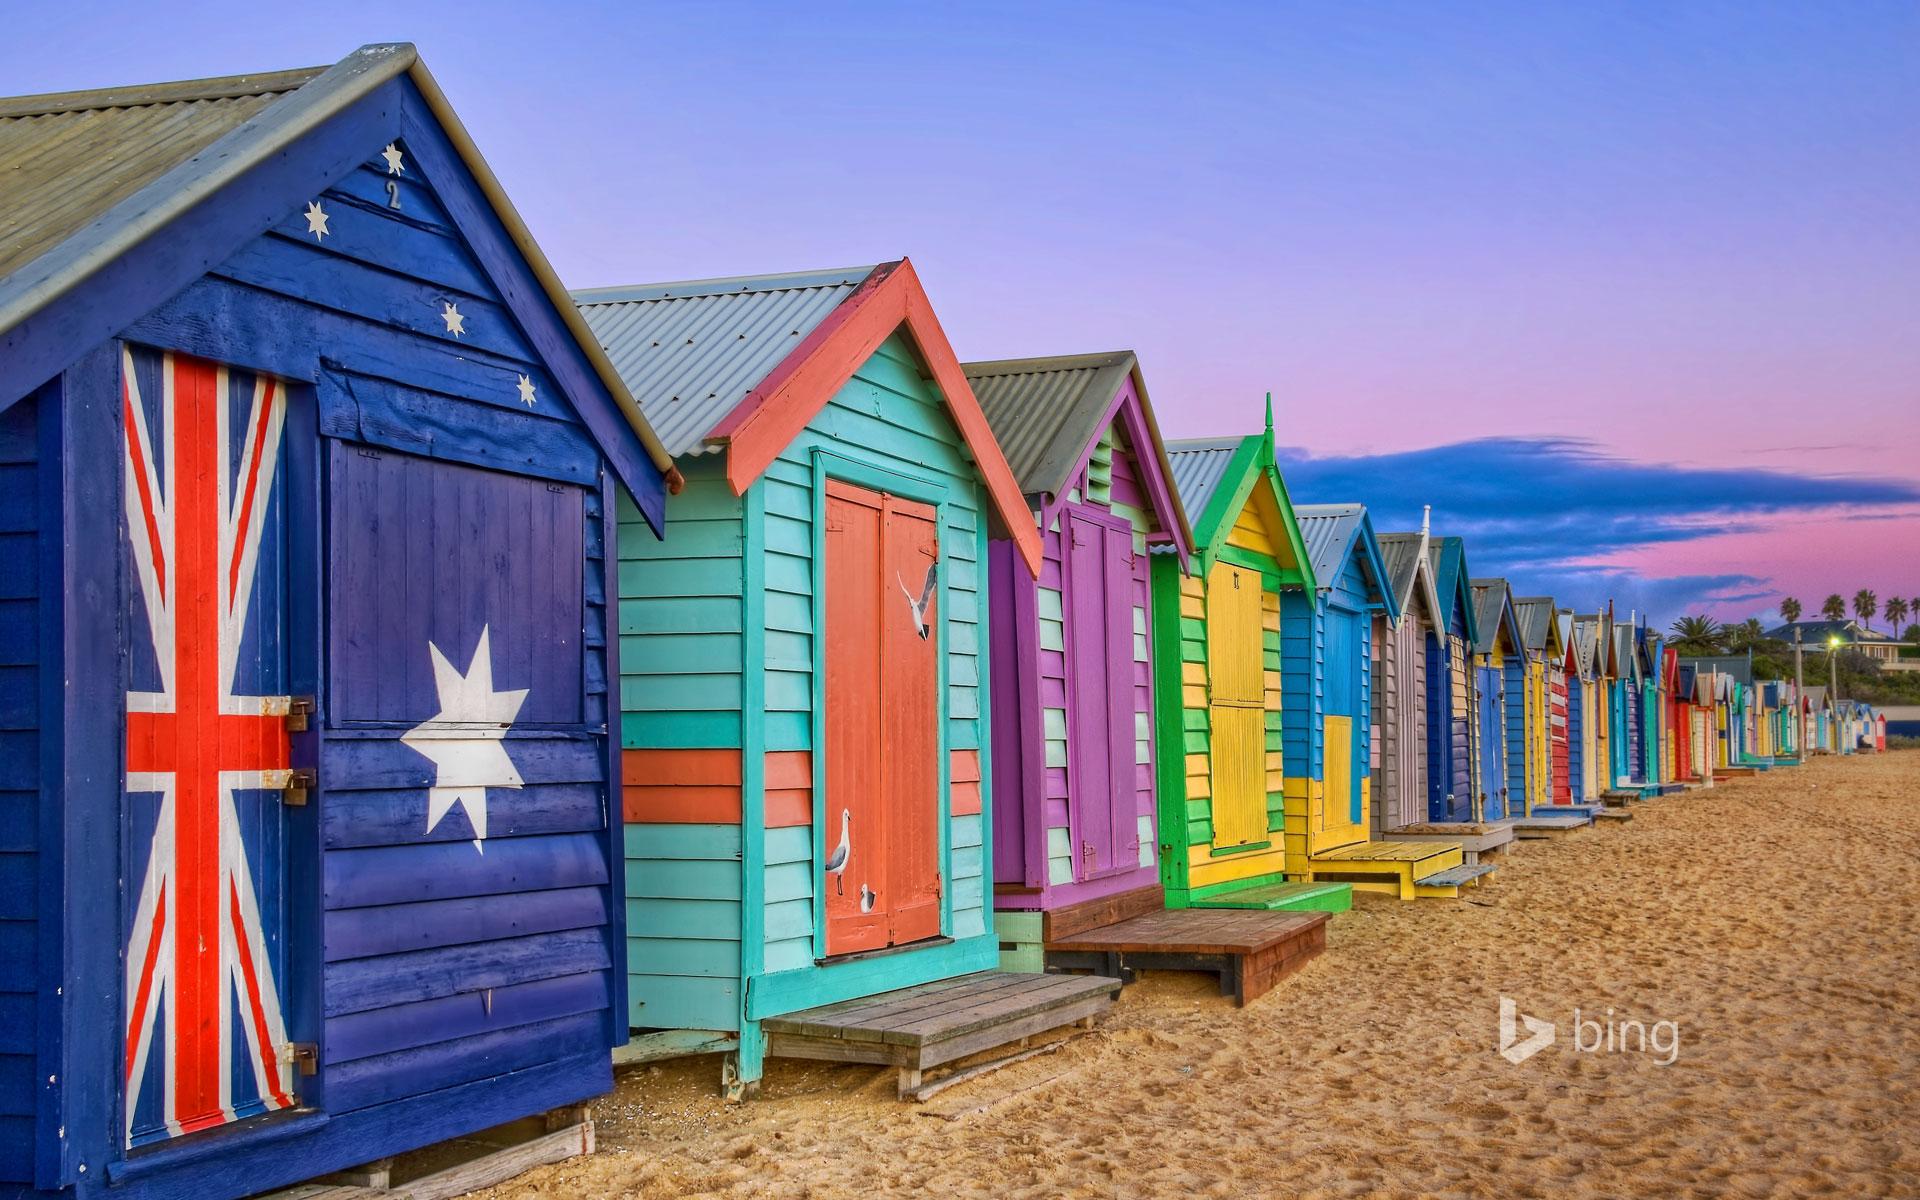 Bathing boxes line the beach at Brighton, Victoria, Australia